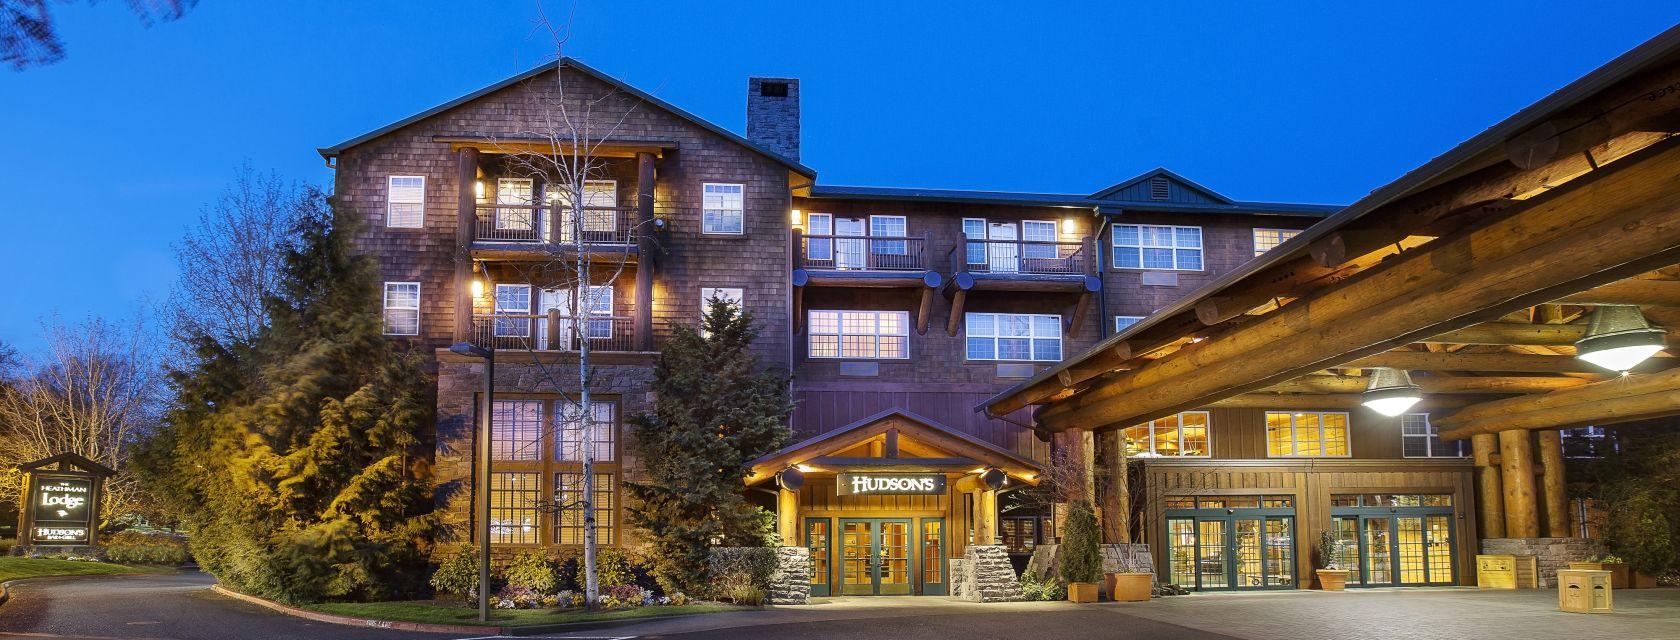 Heathman Hotel Vancouver Restaurant